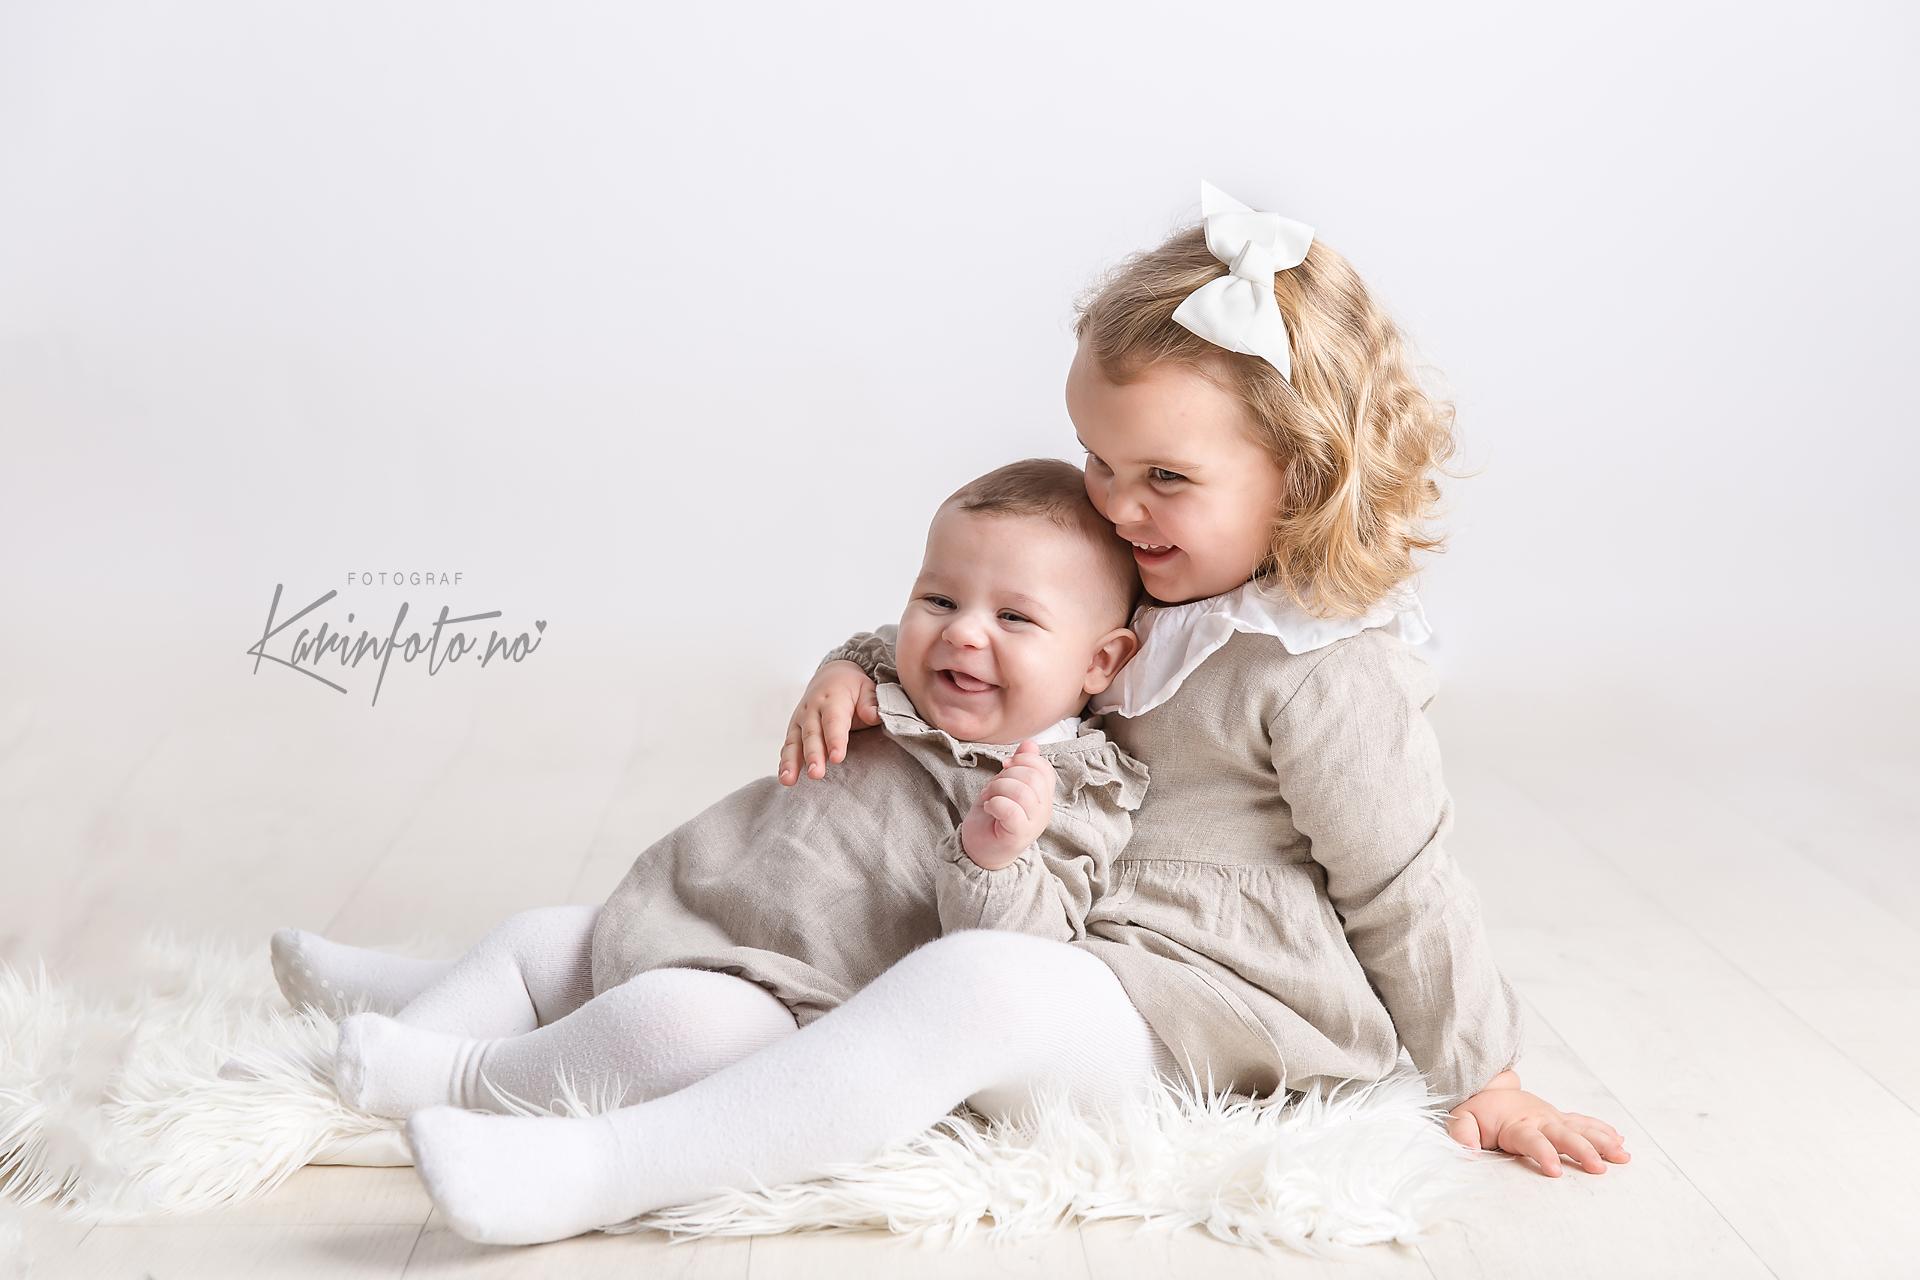 søskenfotografering,karinfoto,babyfotograf,sarpsborg,oslo,østfold